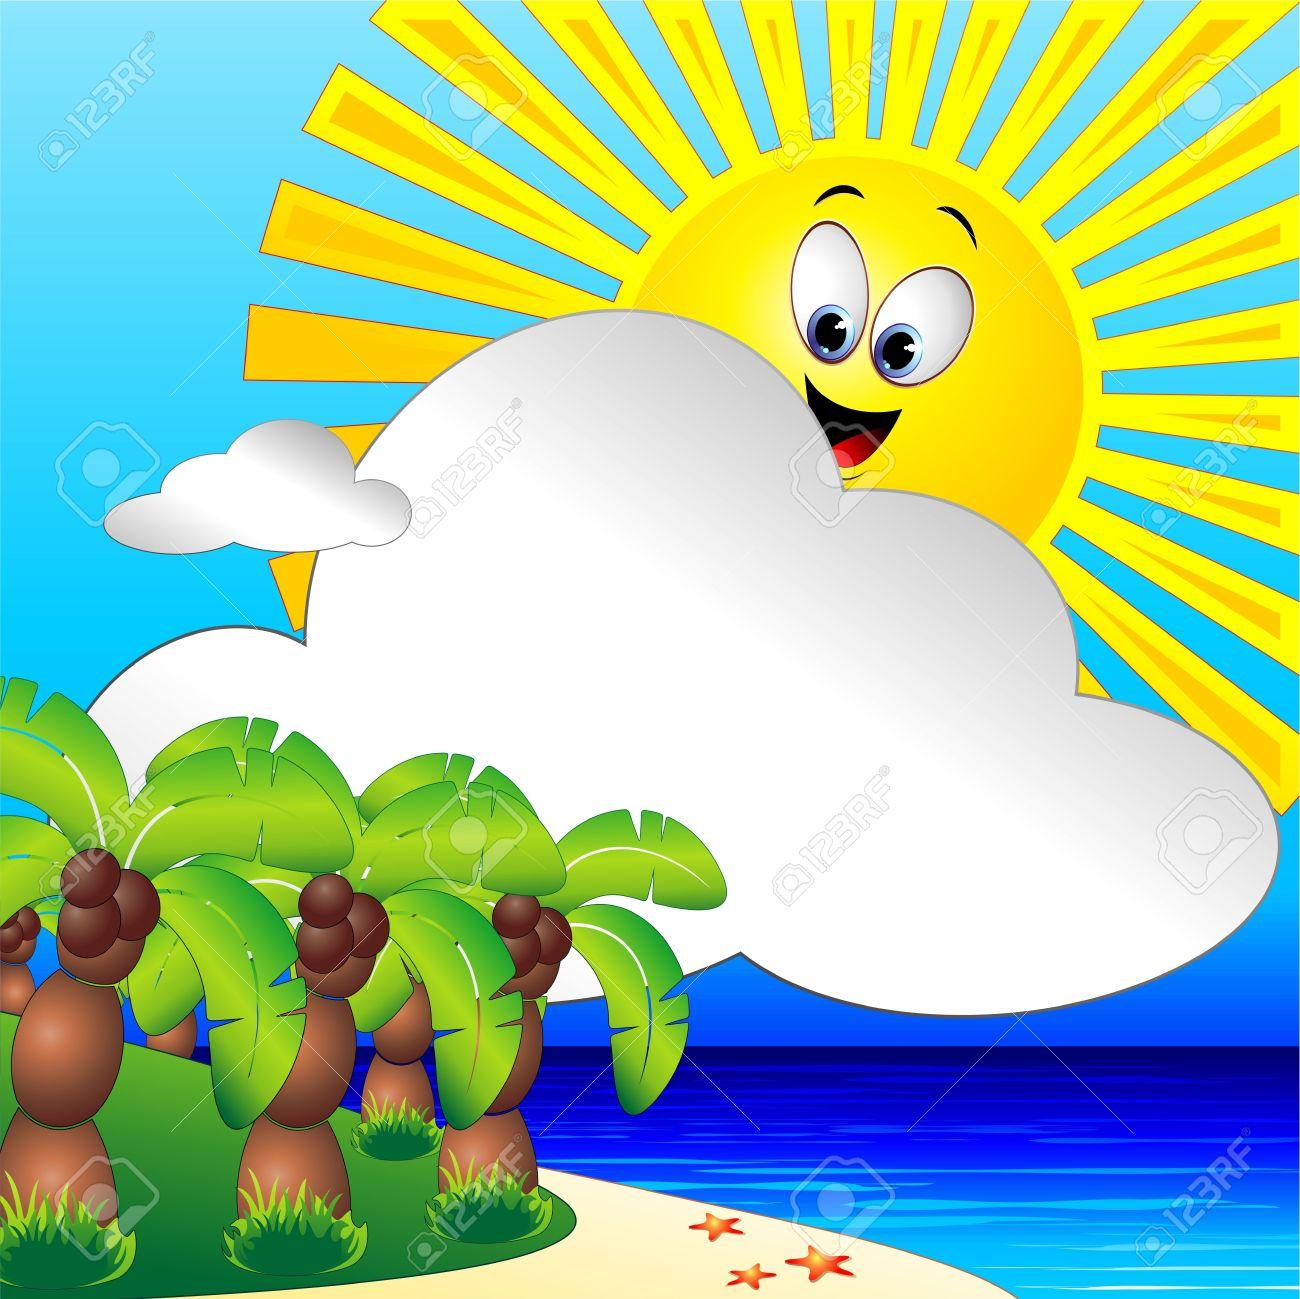 Vacation clipart sunny beach 30 Summer – Holiday Art